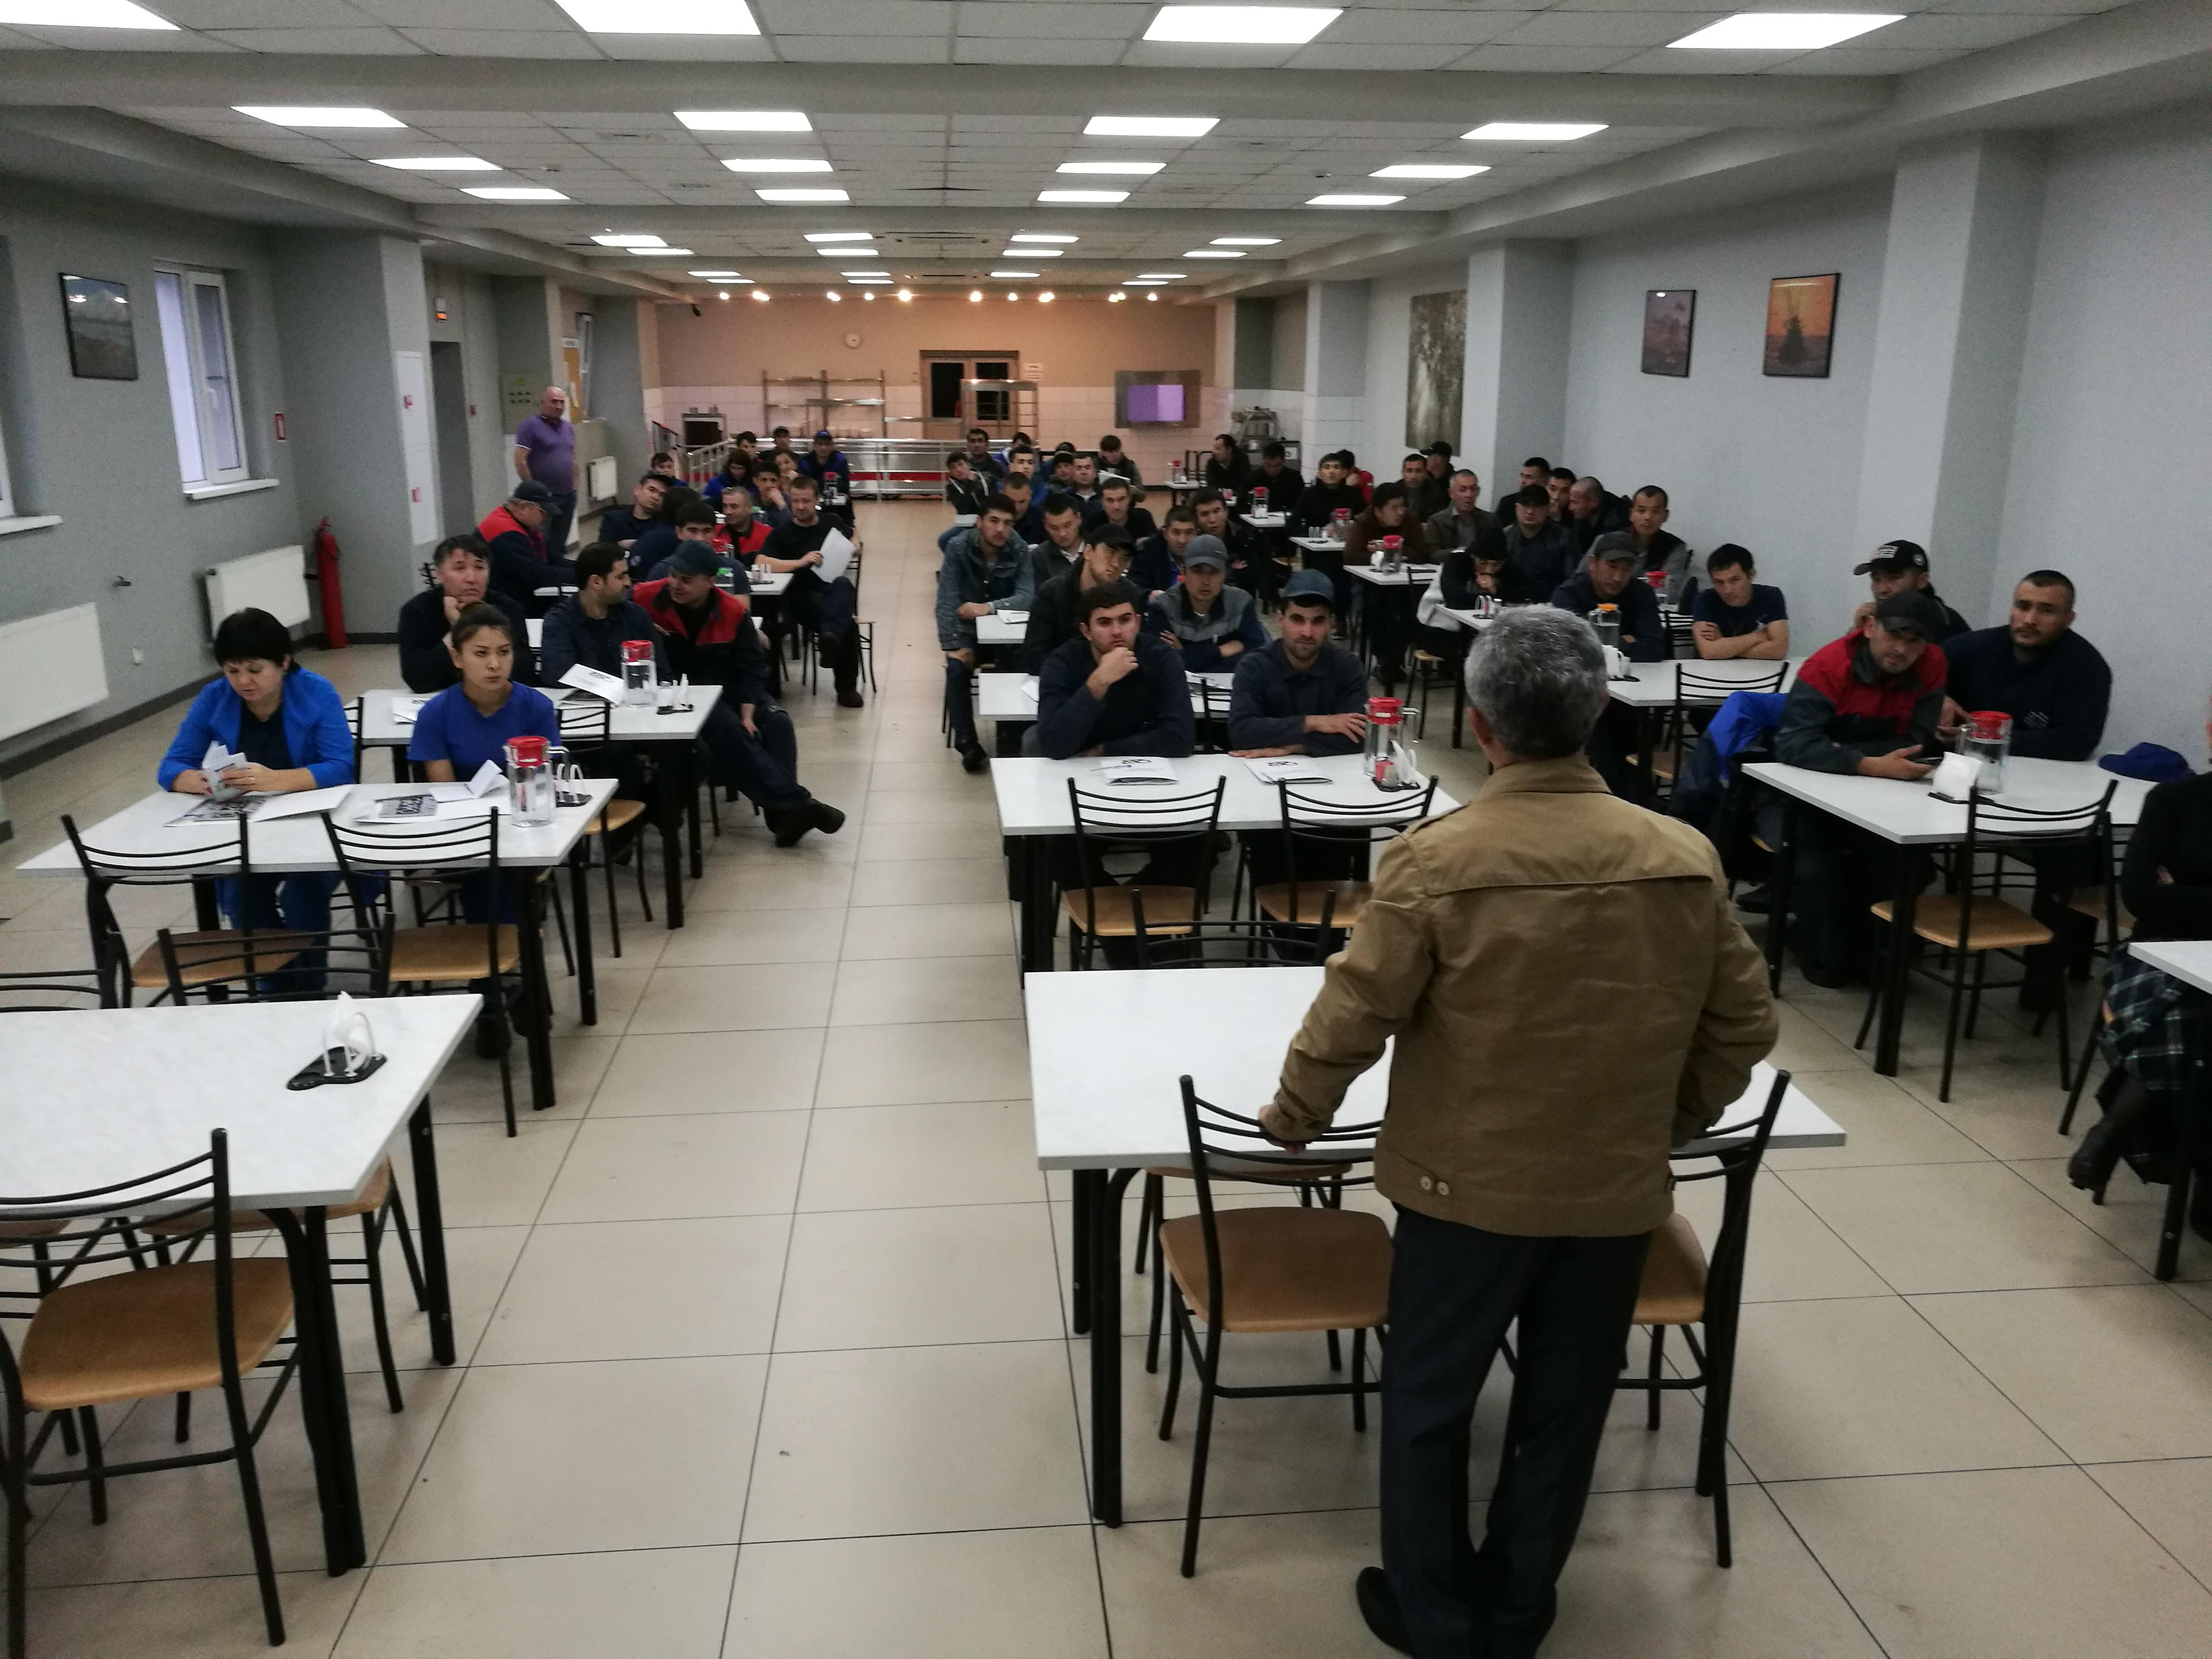 проект Ленинградской области по работе с трудовыми мигрантами, Кириши, 18.09.2017